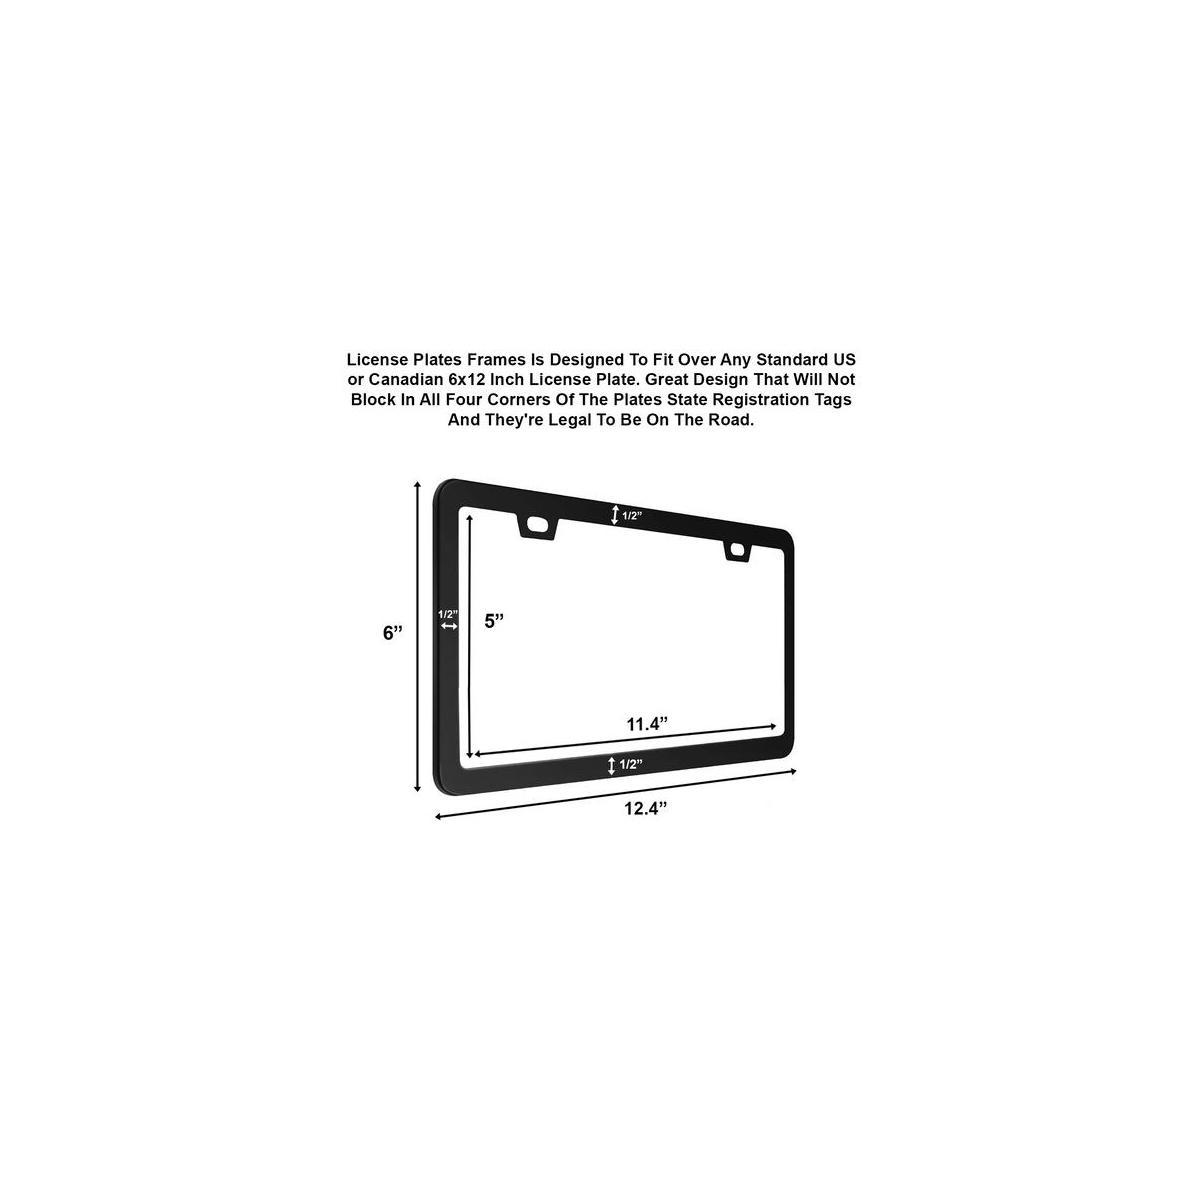 Car License Plate Frames, 2 Pack Matte Aluminum Slim Design Plate Frames